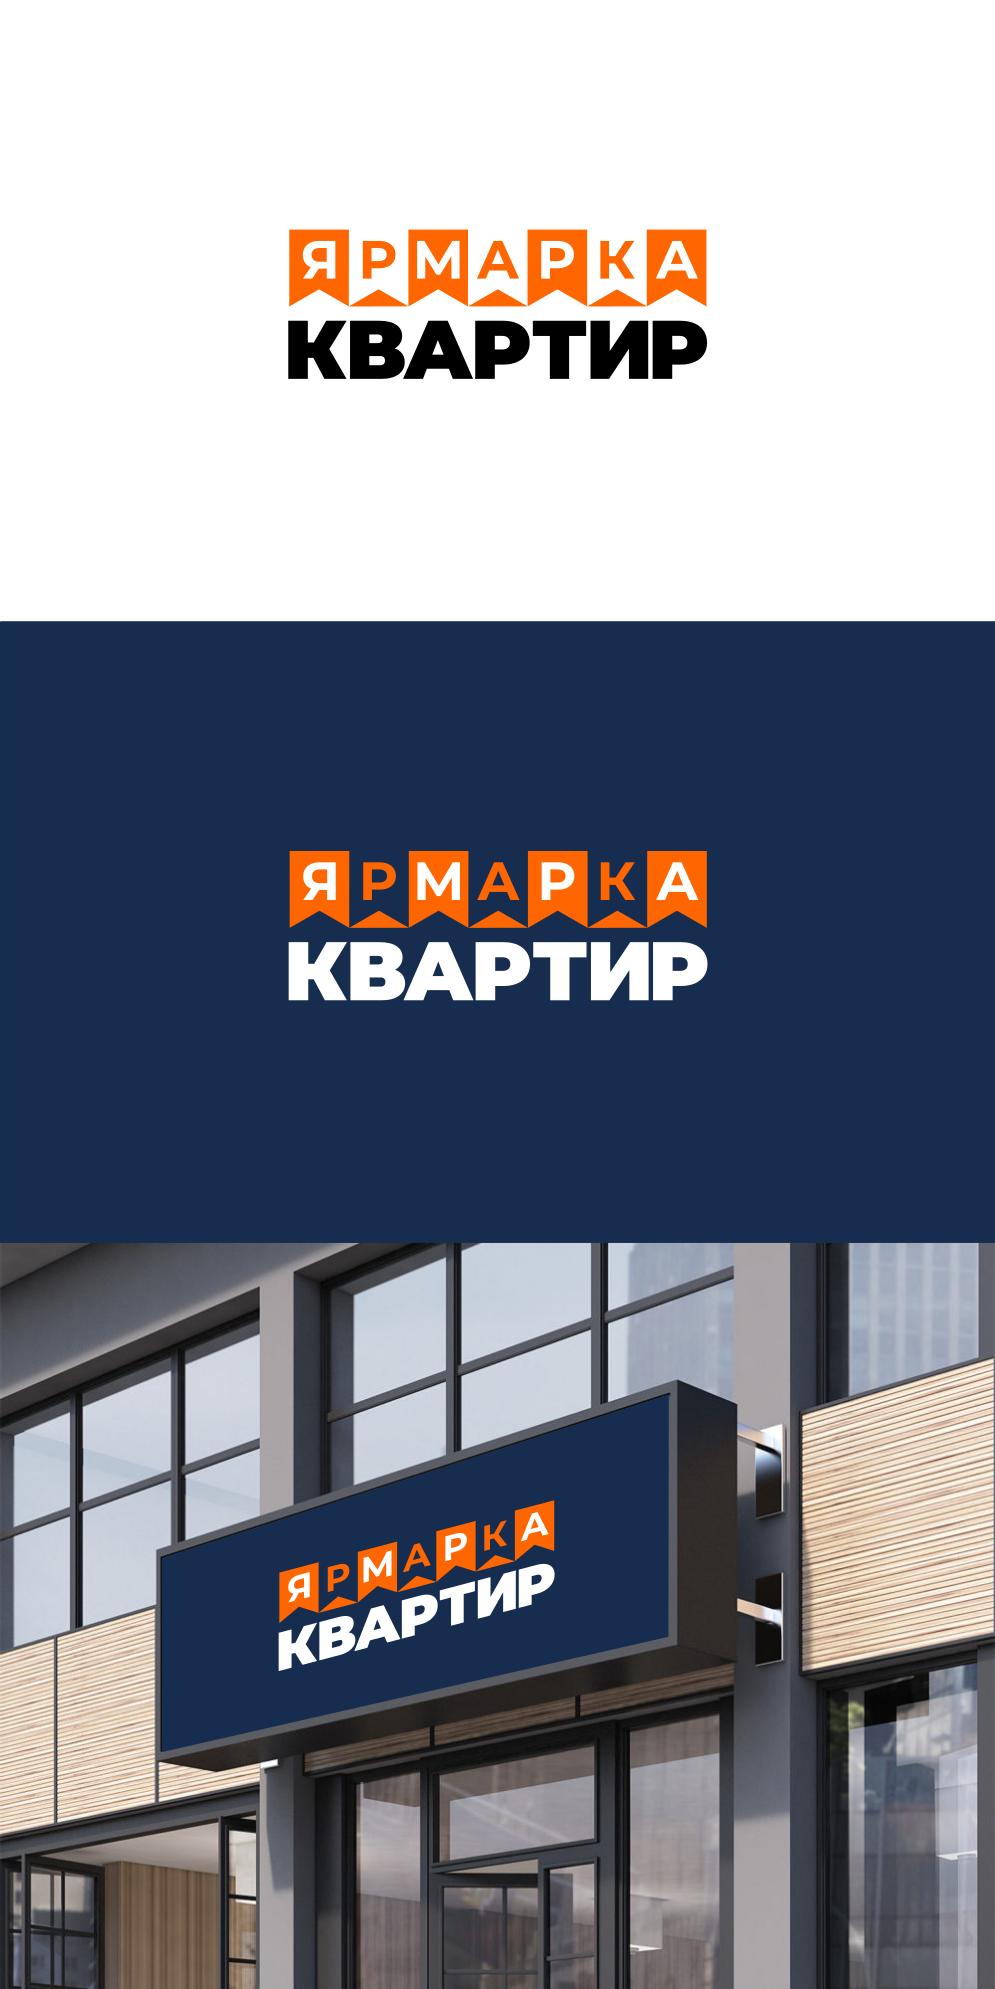 Создание логотипа, с вариантами для визитки и листовки фото f_9936005b835b23cb.png